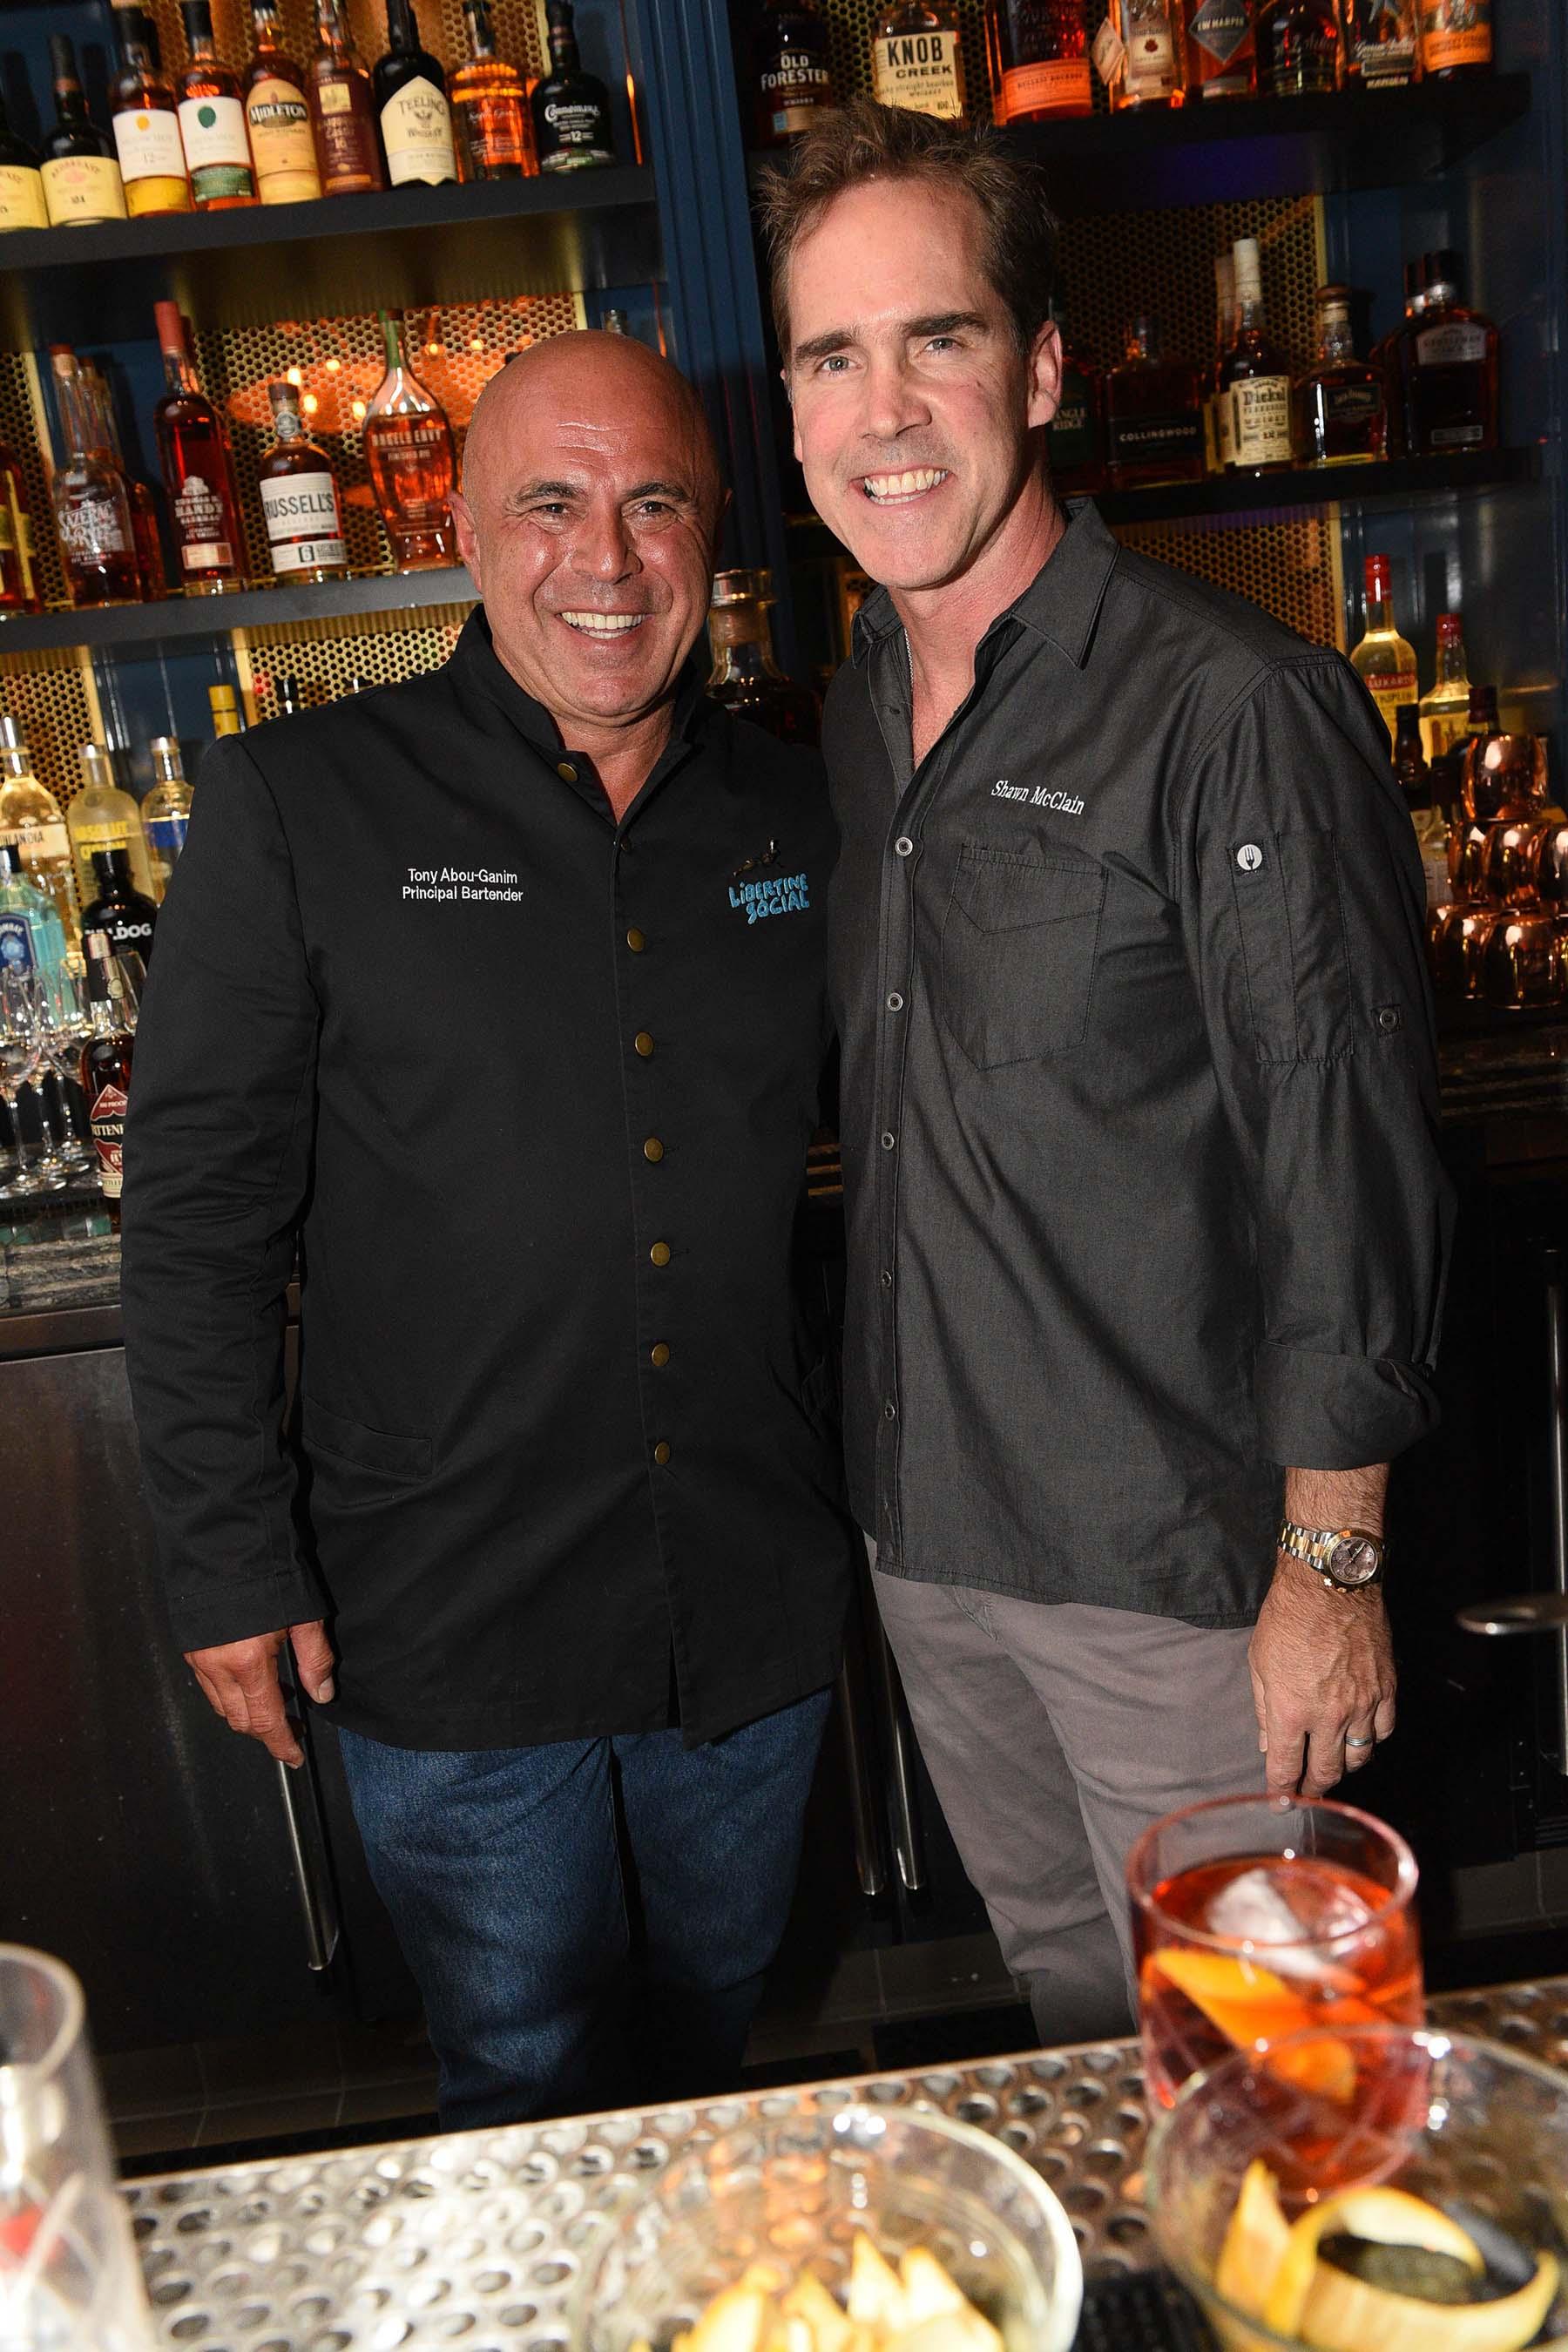 Modern Mixologist Tony Abou-Ganim and James Beard Award-winning Chef Shawn McClain